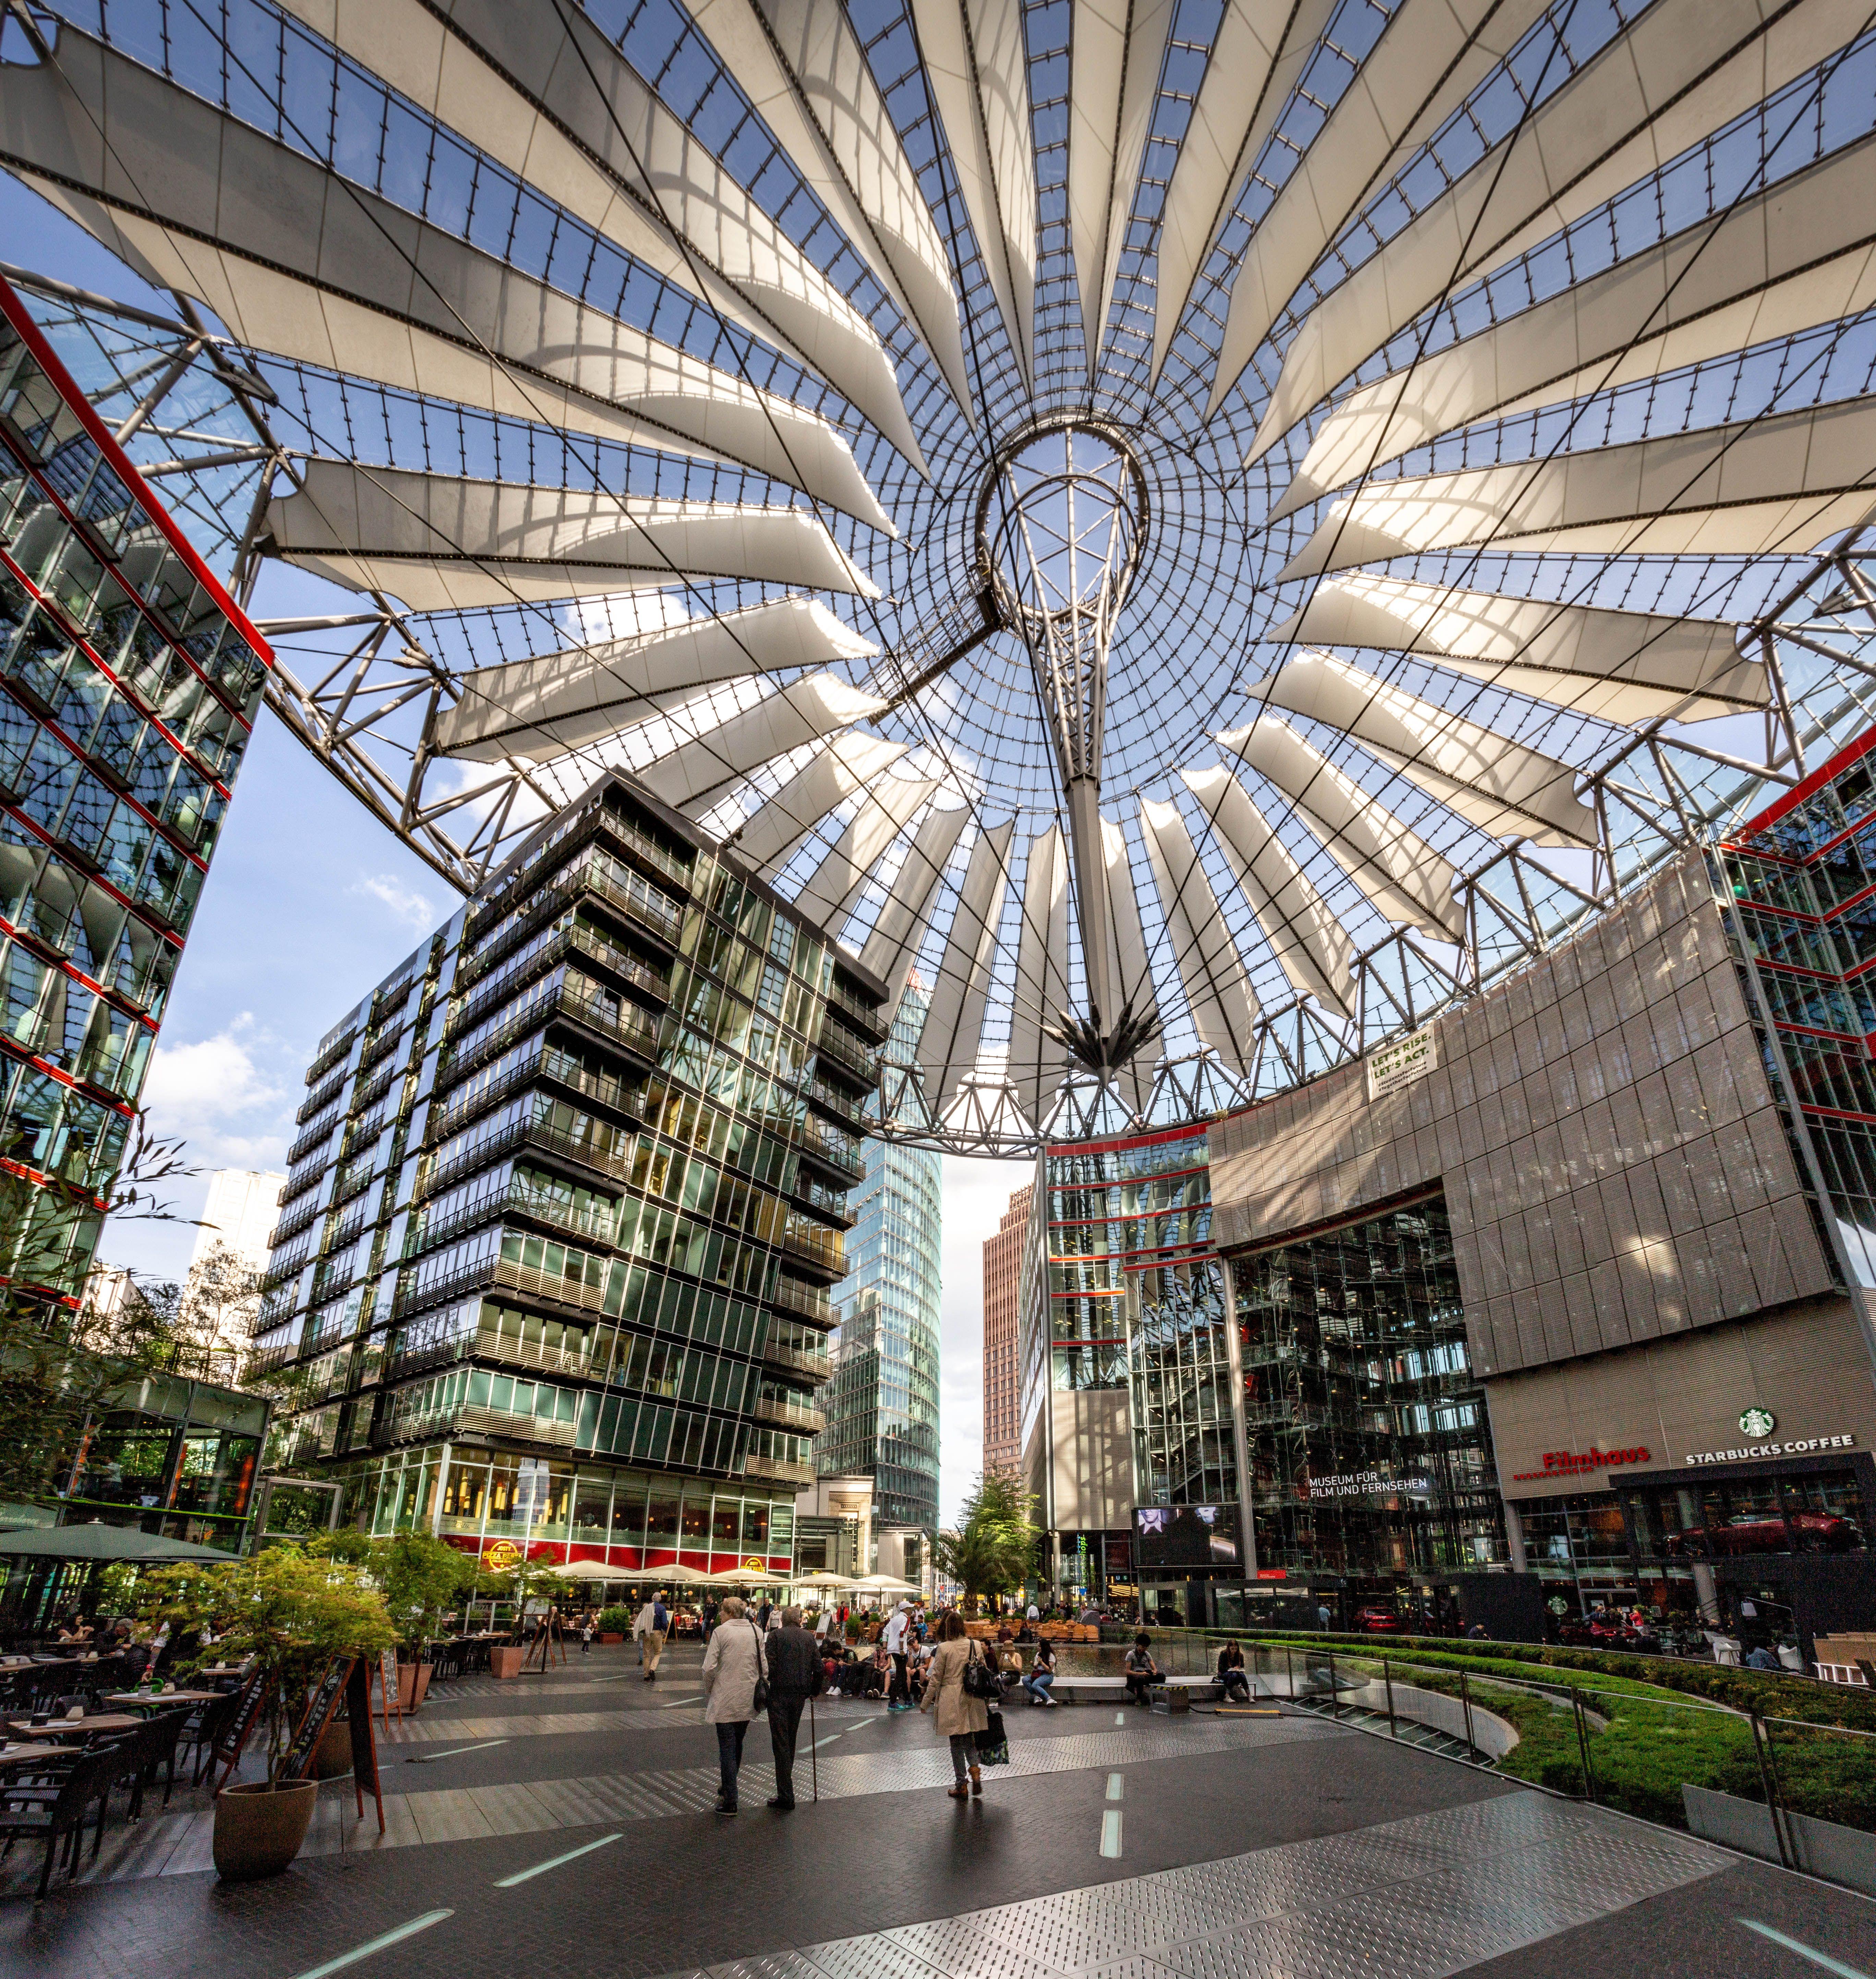 Vw Of America >> Berlin's Potsdamer Platz: The Complete Guide